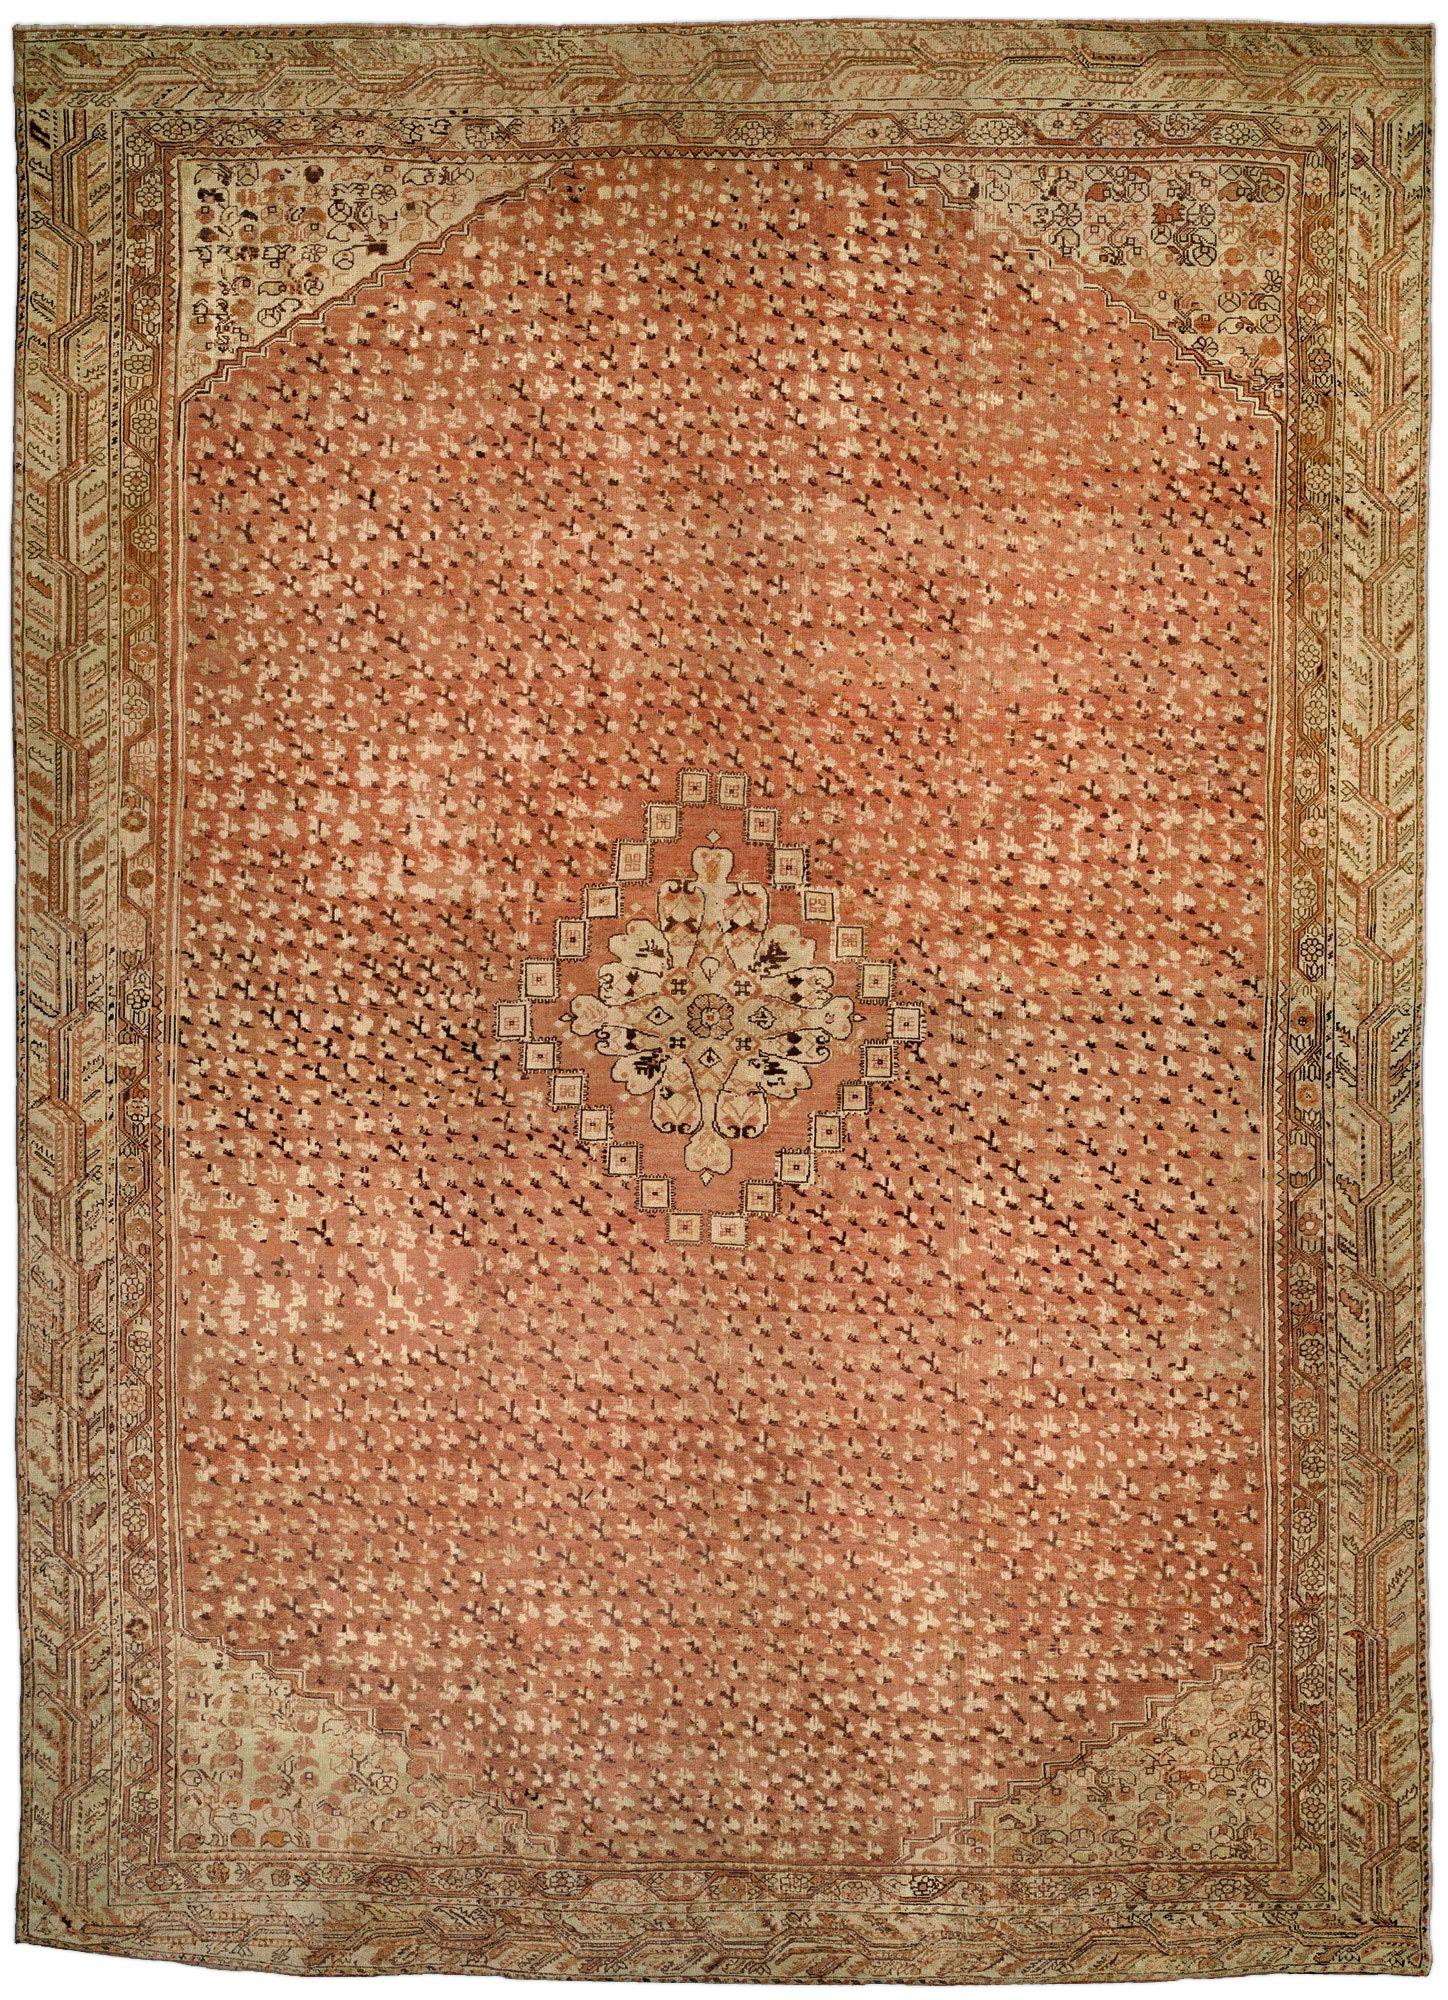 Antique Turkish Ghiordes Carpet Rugs Pinterest Tapis - Carrelage terrasse et tapis chirvan ancien